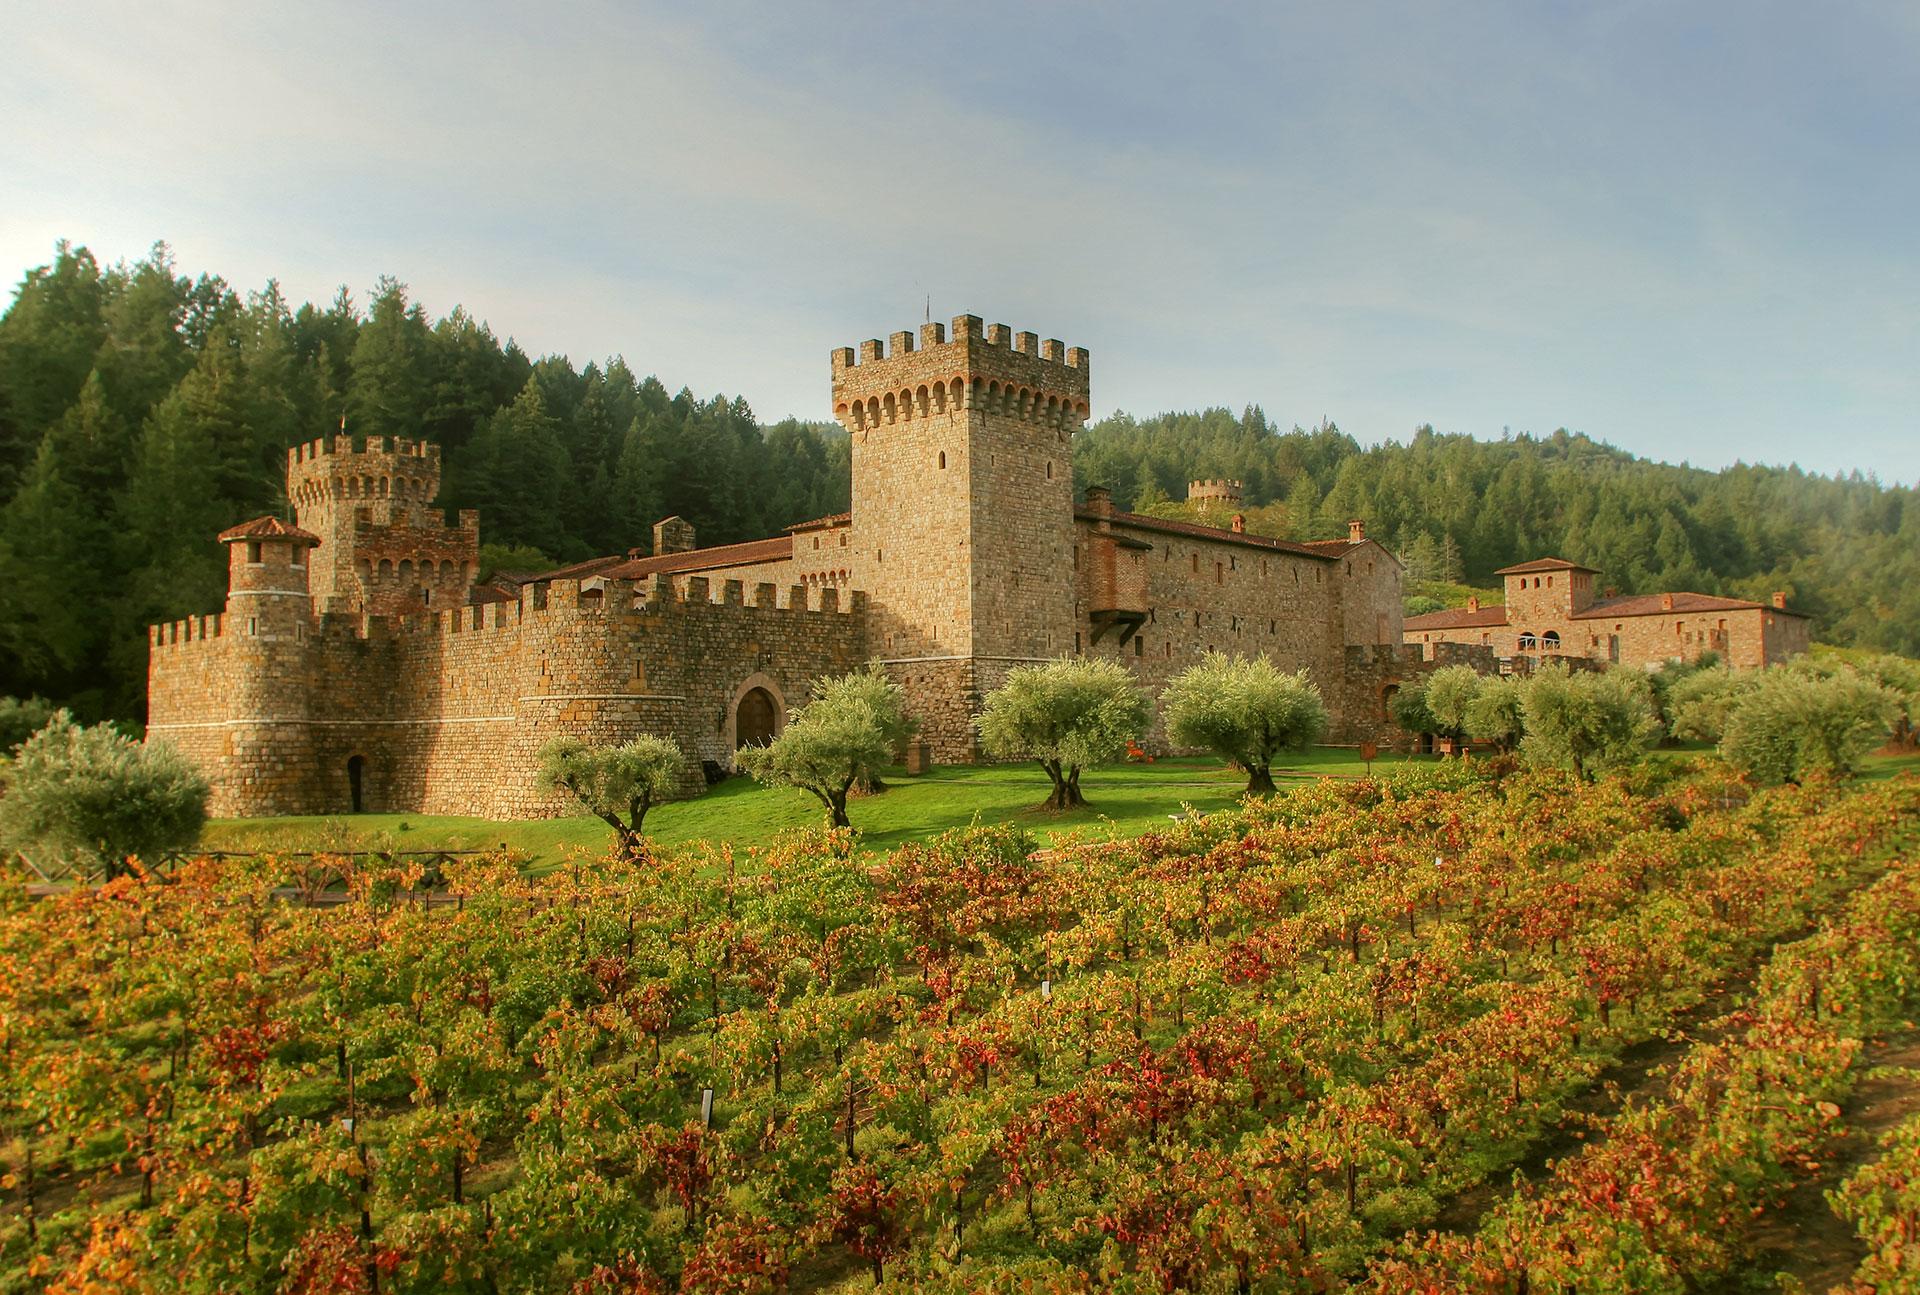 Castello di Amorosa castle exterior and vineyard